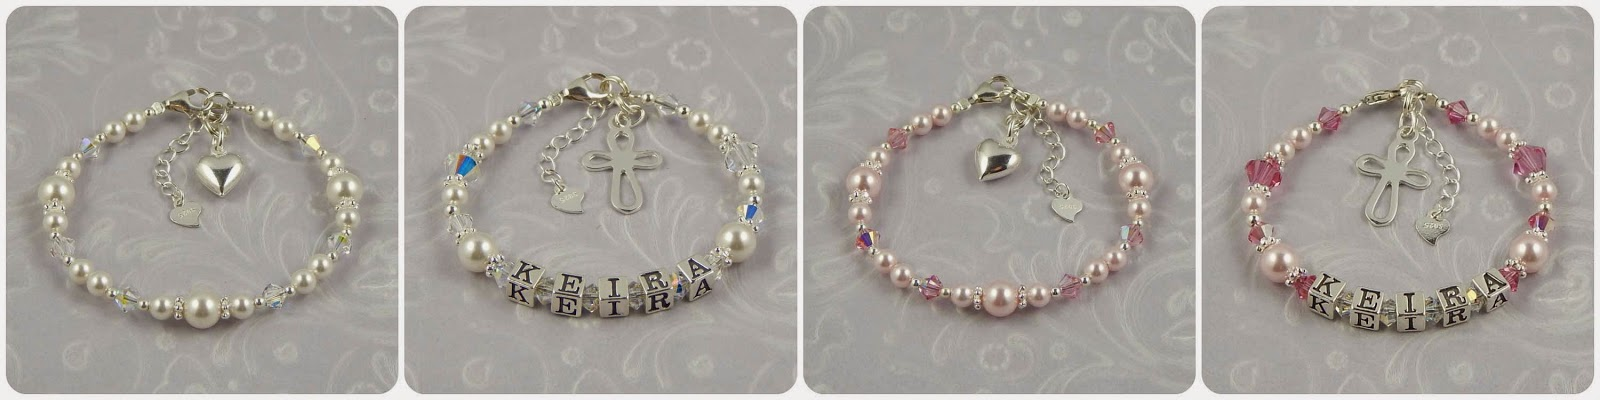 Christening jewellery range